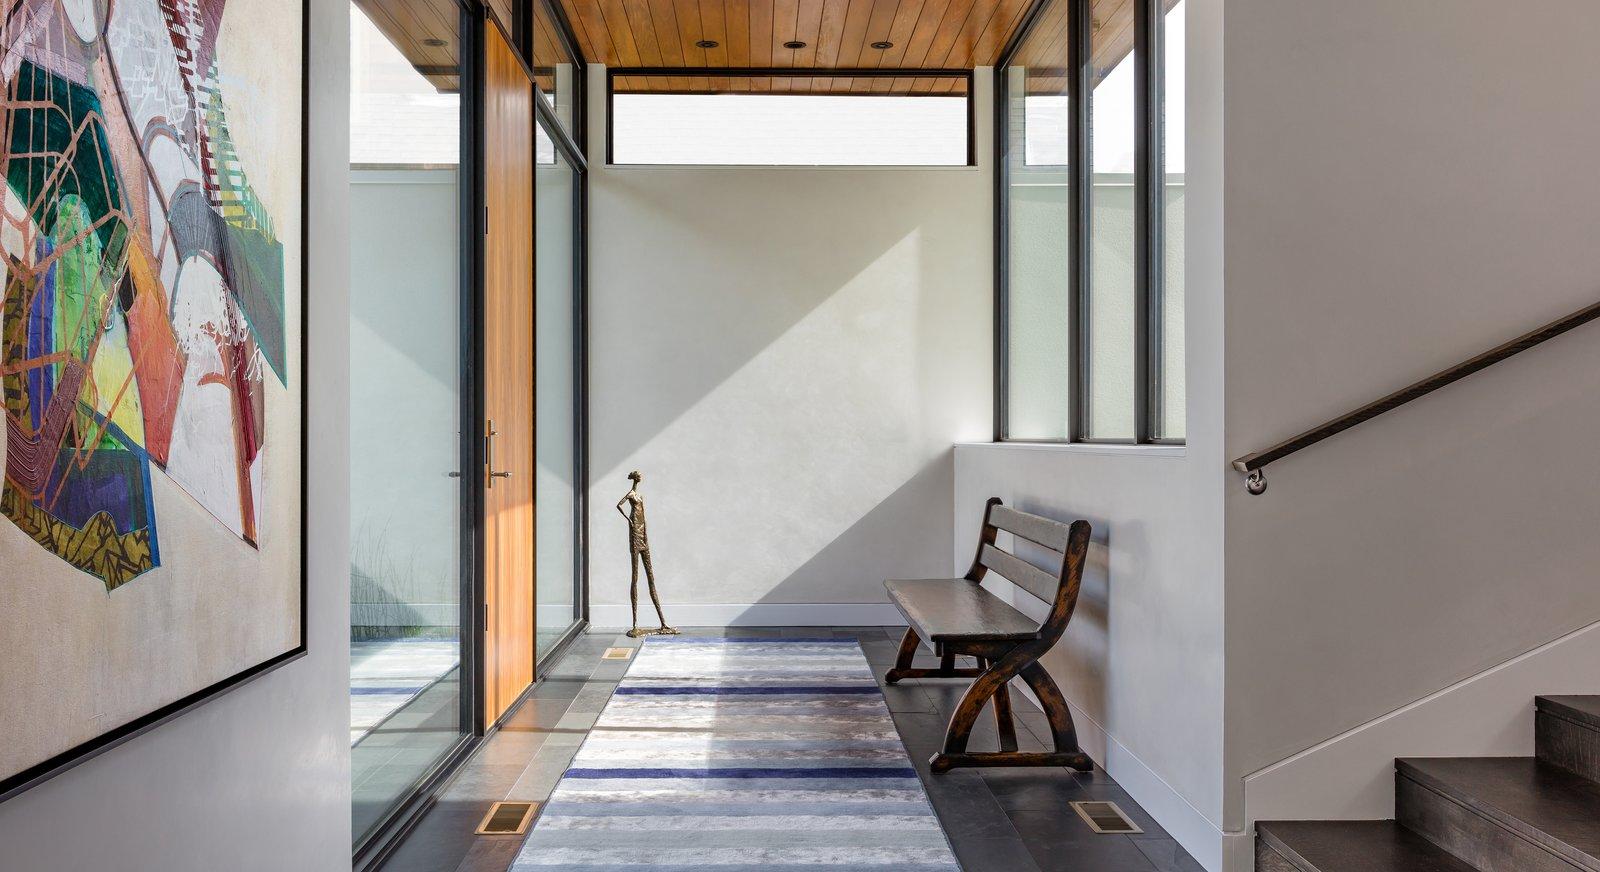 Ceramic Tile Floor, Exterior, Swing Door Type, Windows, Picture Window Type, and Metal  Calhoun Pavilions Residence by Peterssen/Keller Architecture